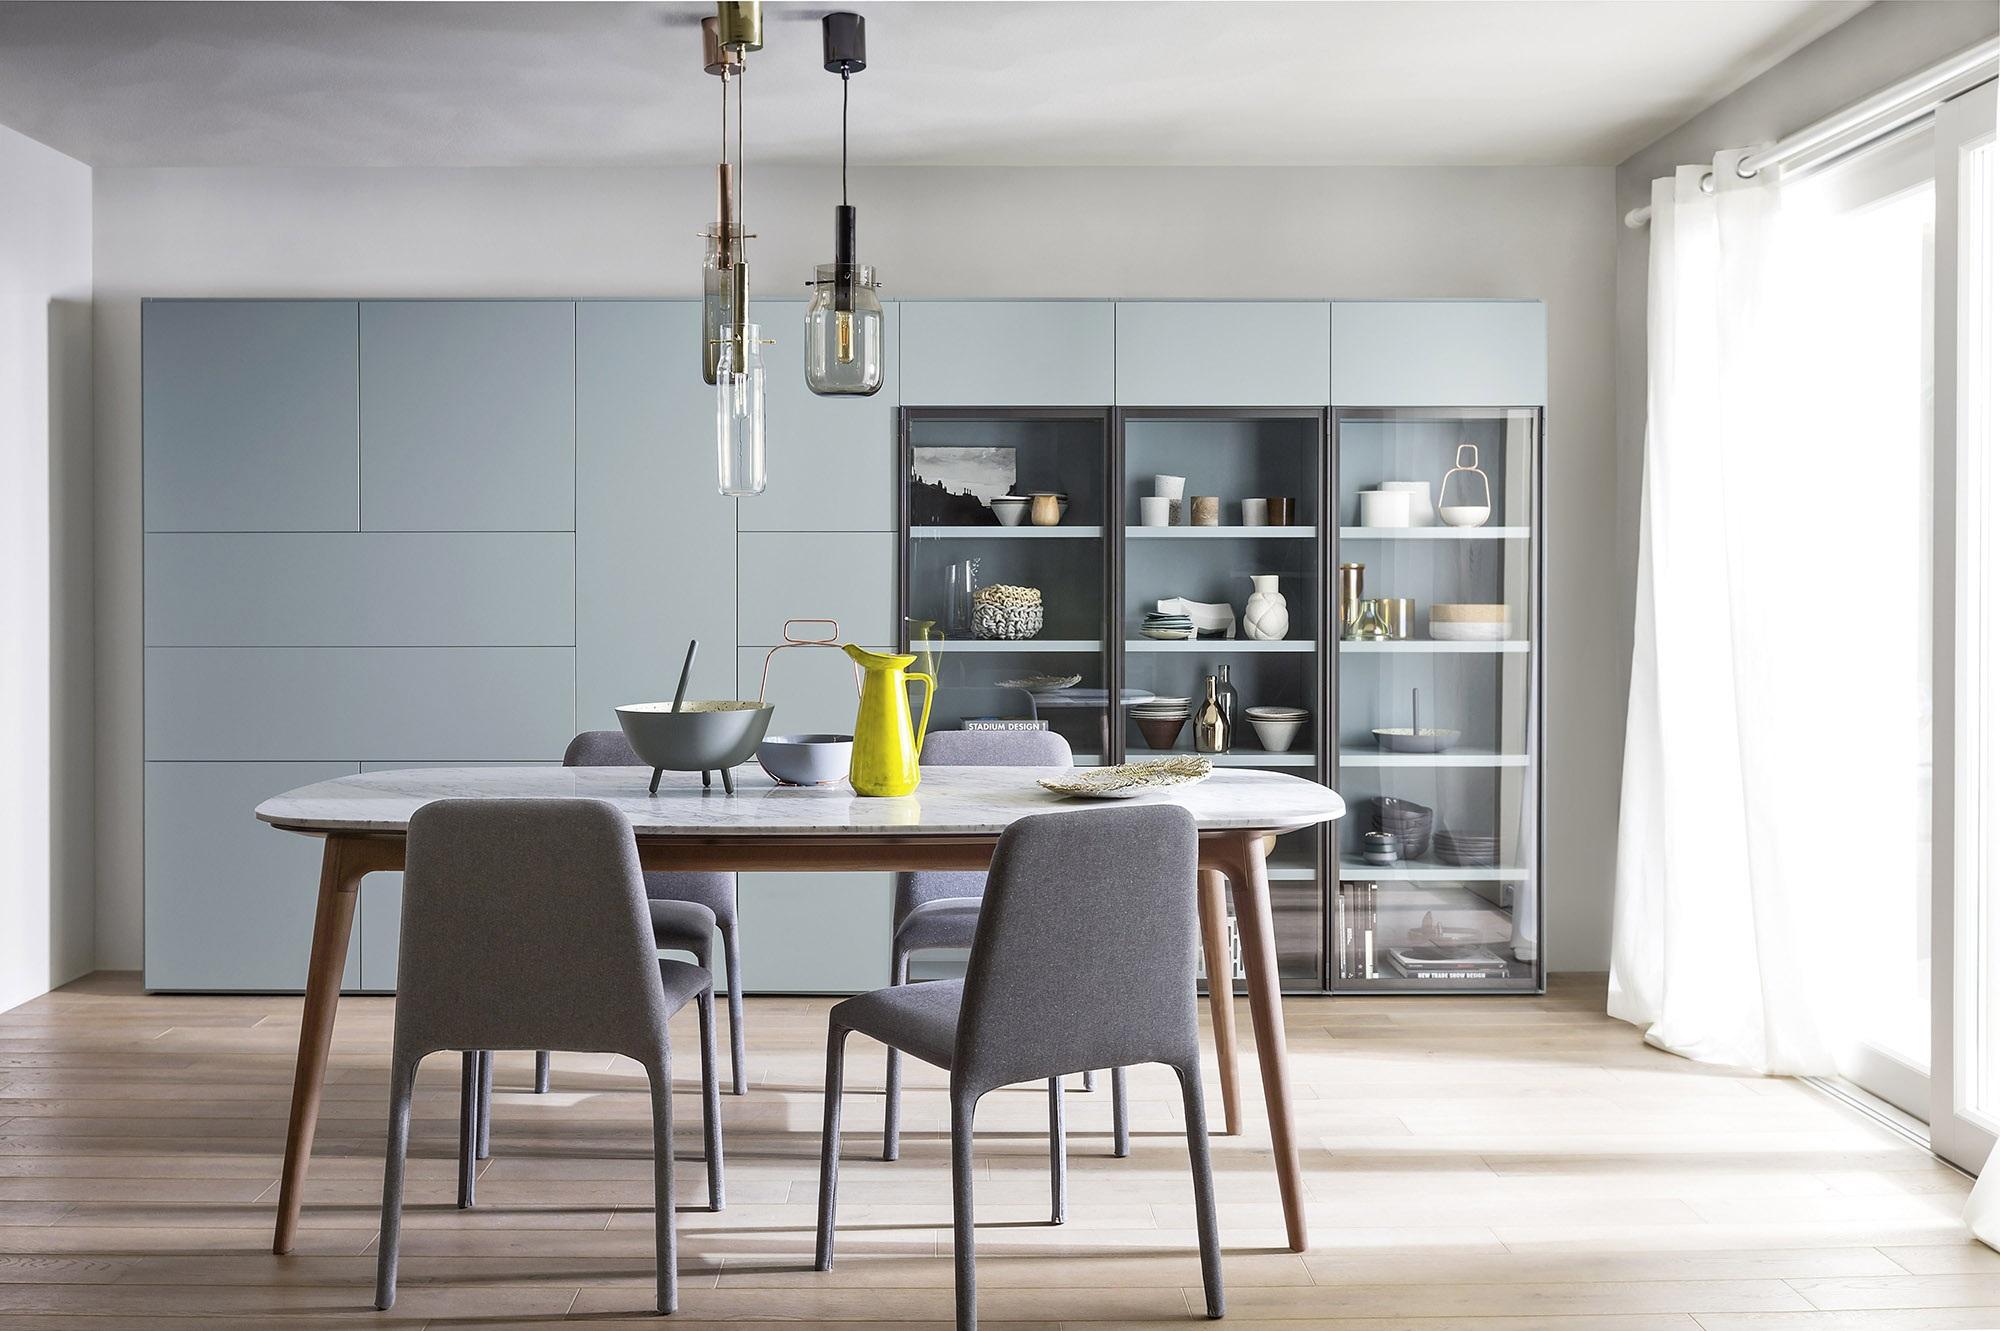 composez votre meuble tv avec wall 30 novamobili chez vestibule paris. Black Bedroom Furniture Sets. Home Design Ideas